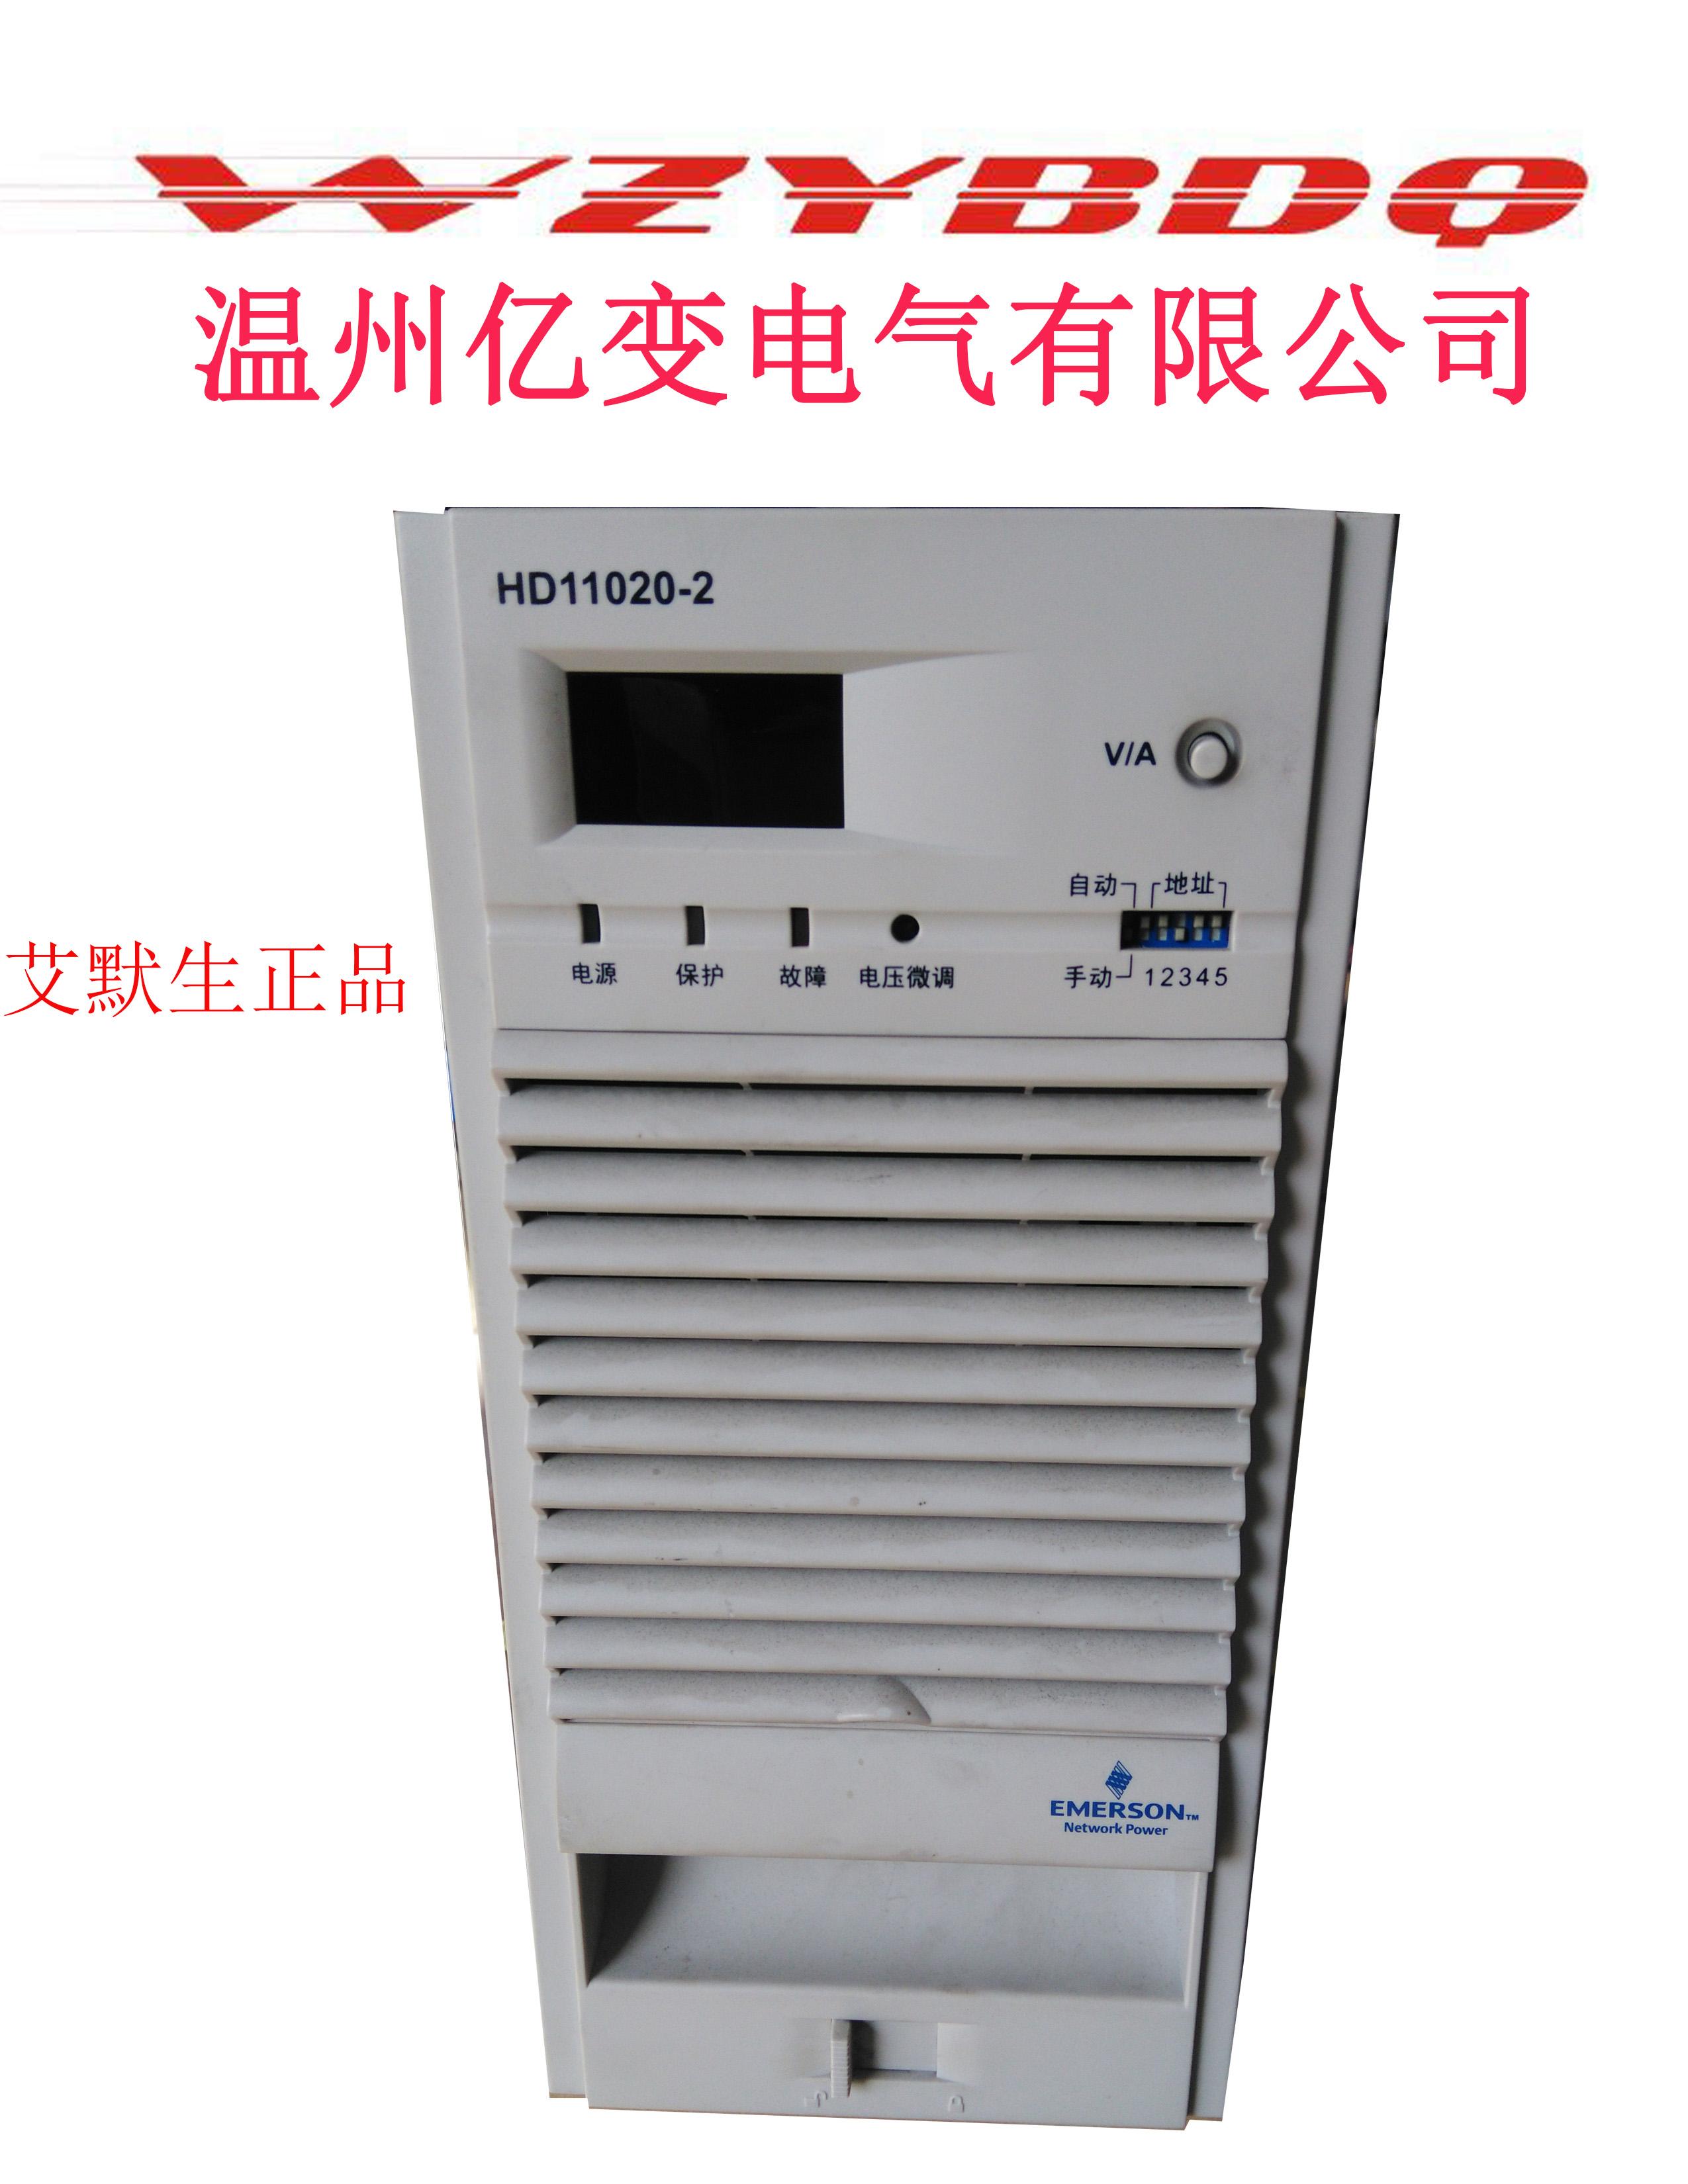 - emerson emerson HD11020-2 energiaegység modul, HD11020-2 dc képernyő